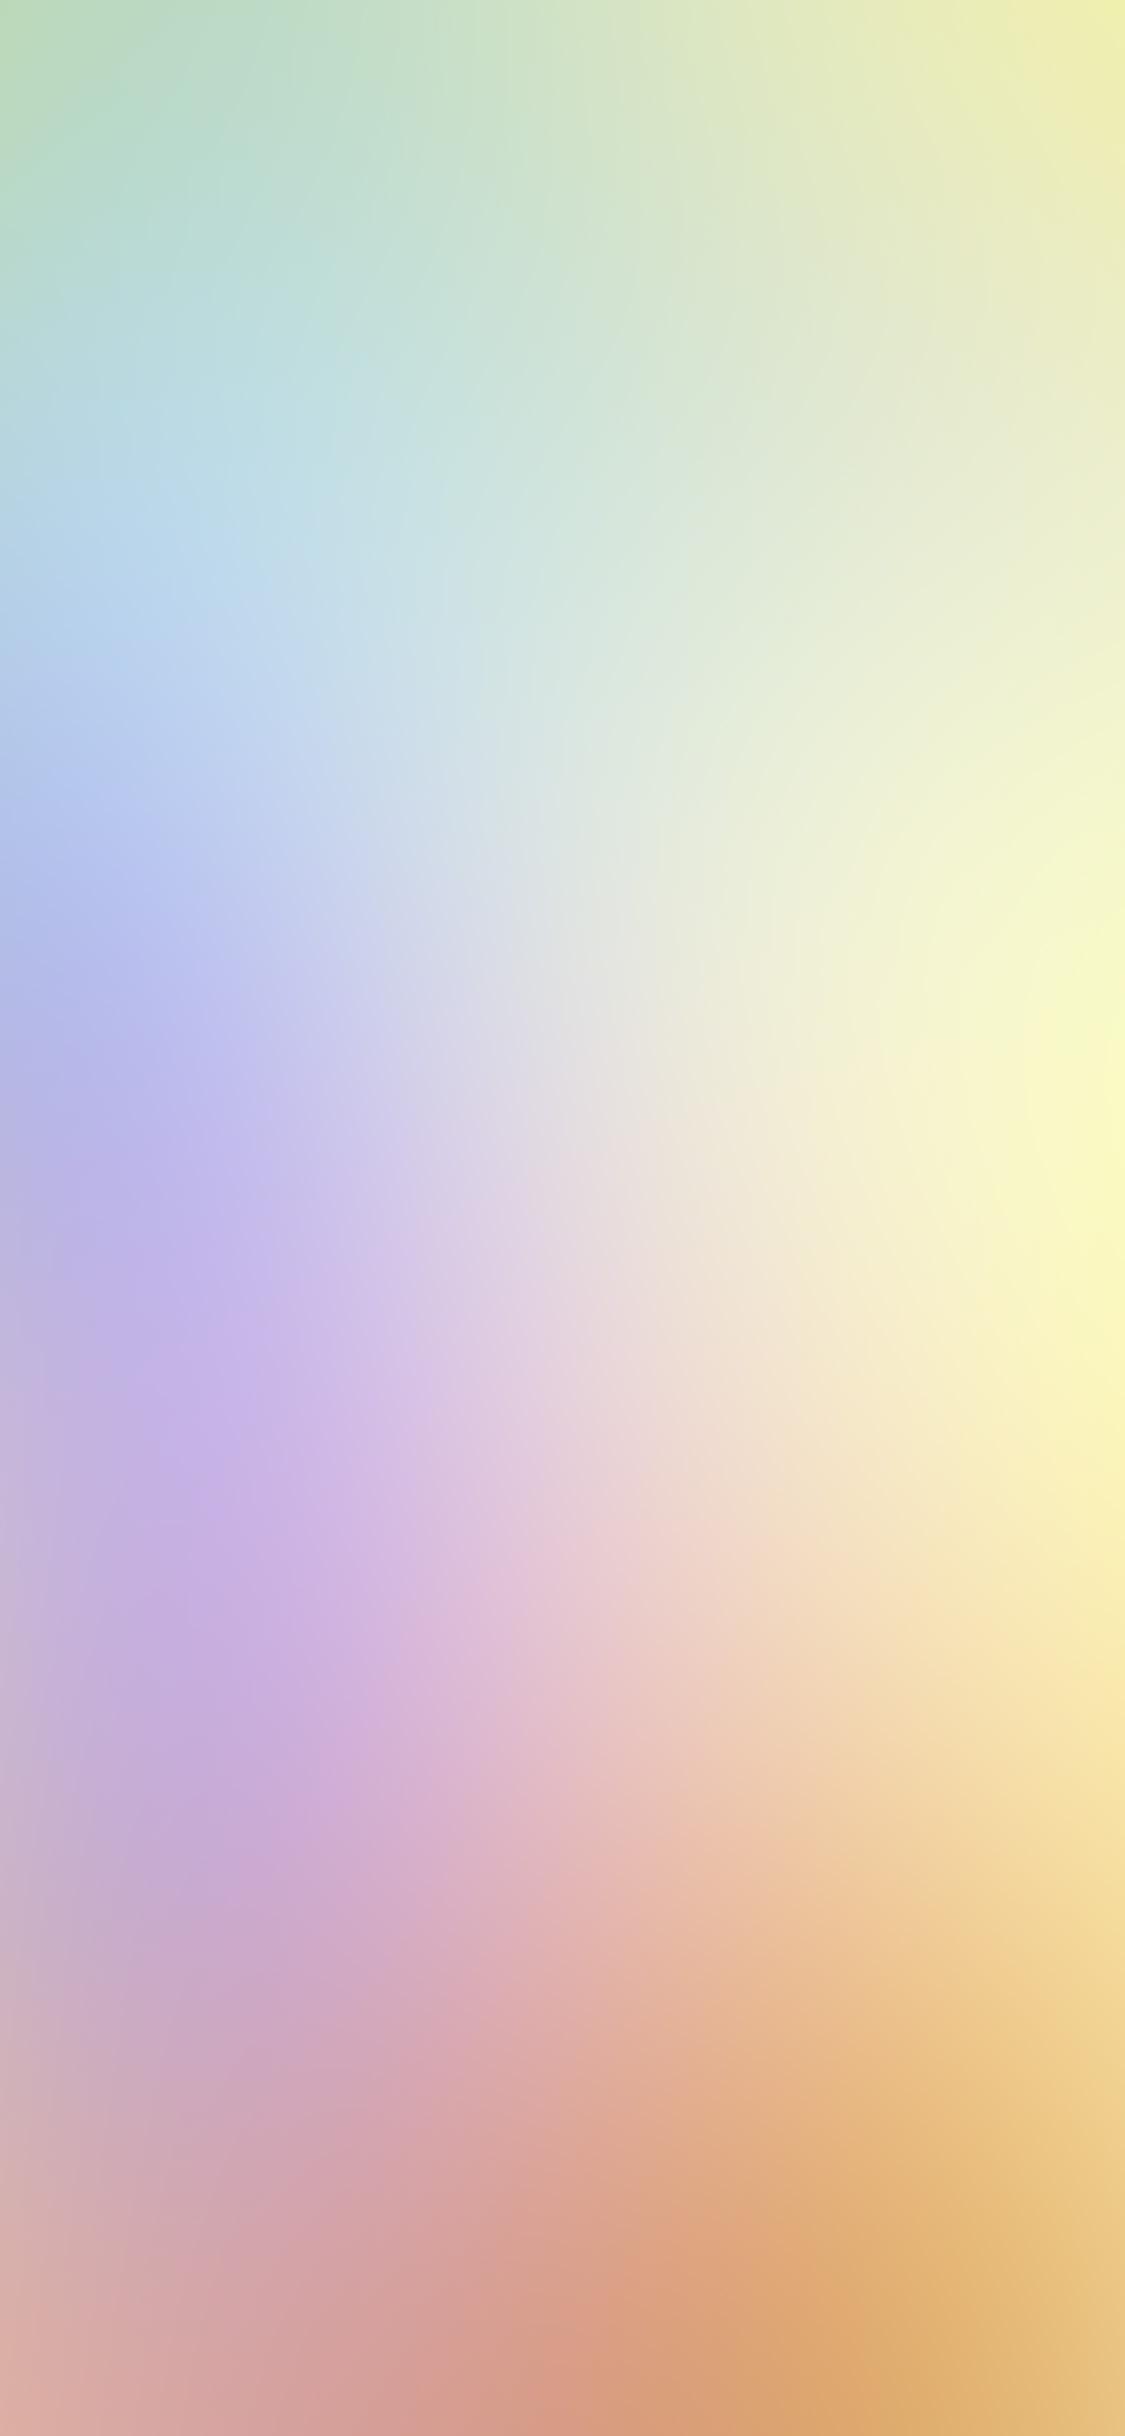 iPhonexpapers.com-Apple-iPhone-wallpaper-sn97-yellow-blur-gradation